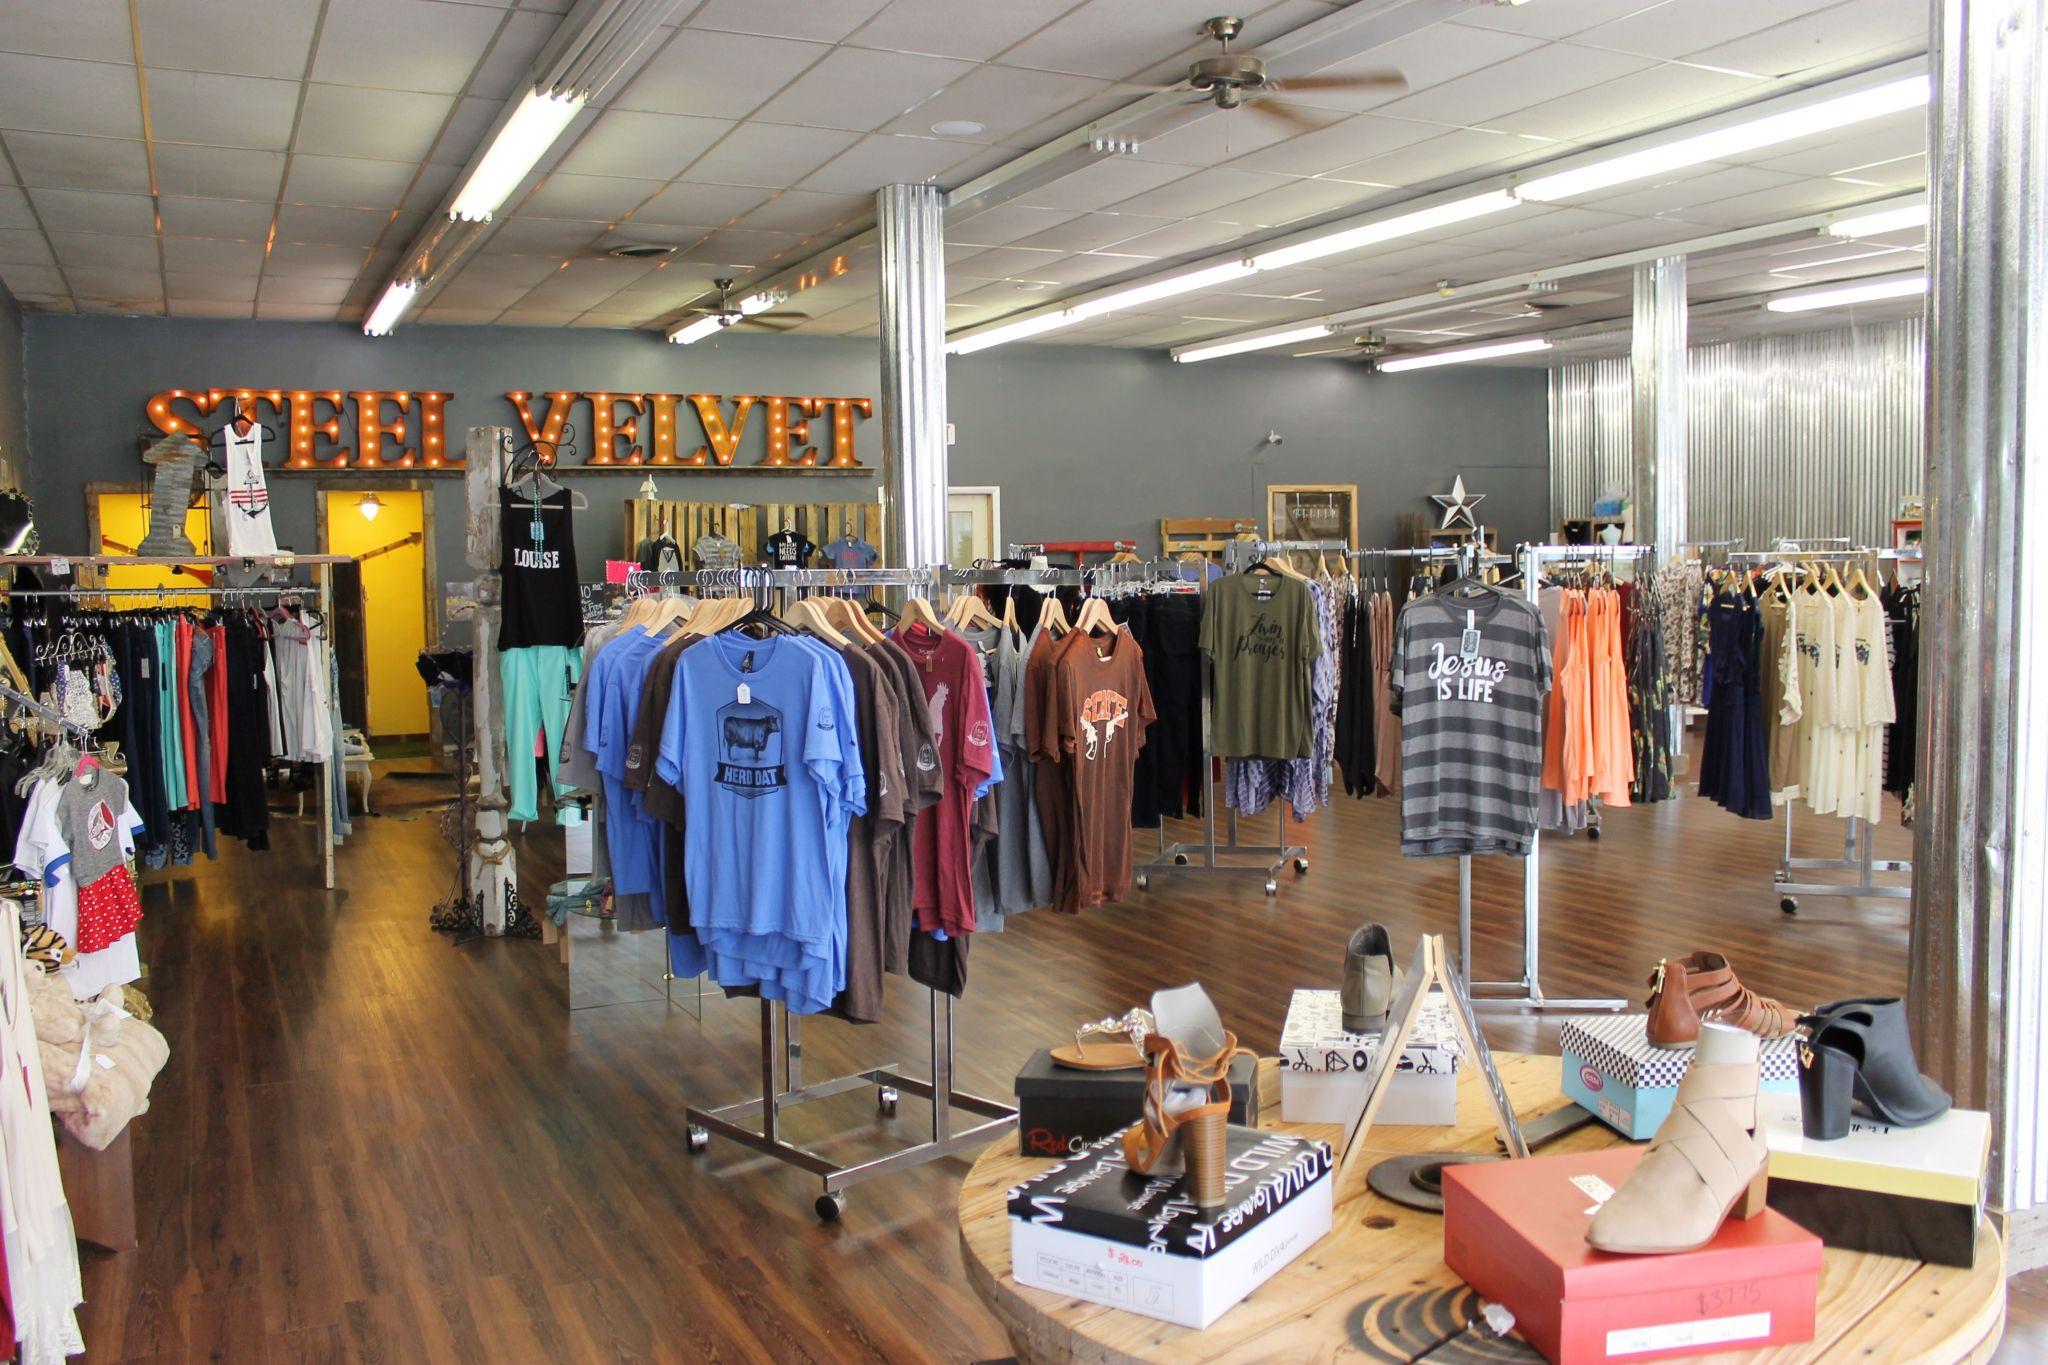 Steel Velvet Boutique in Chickasha